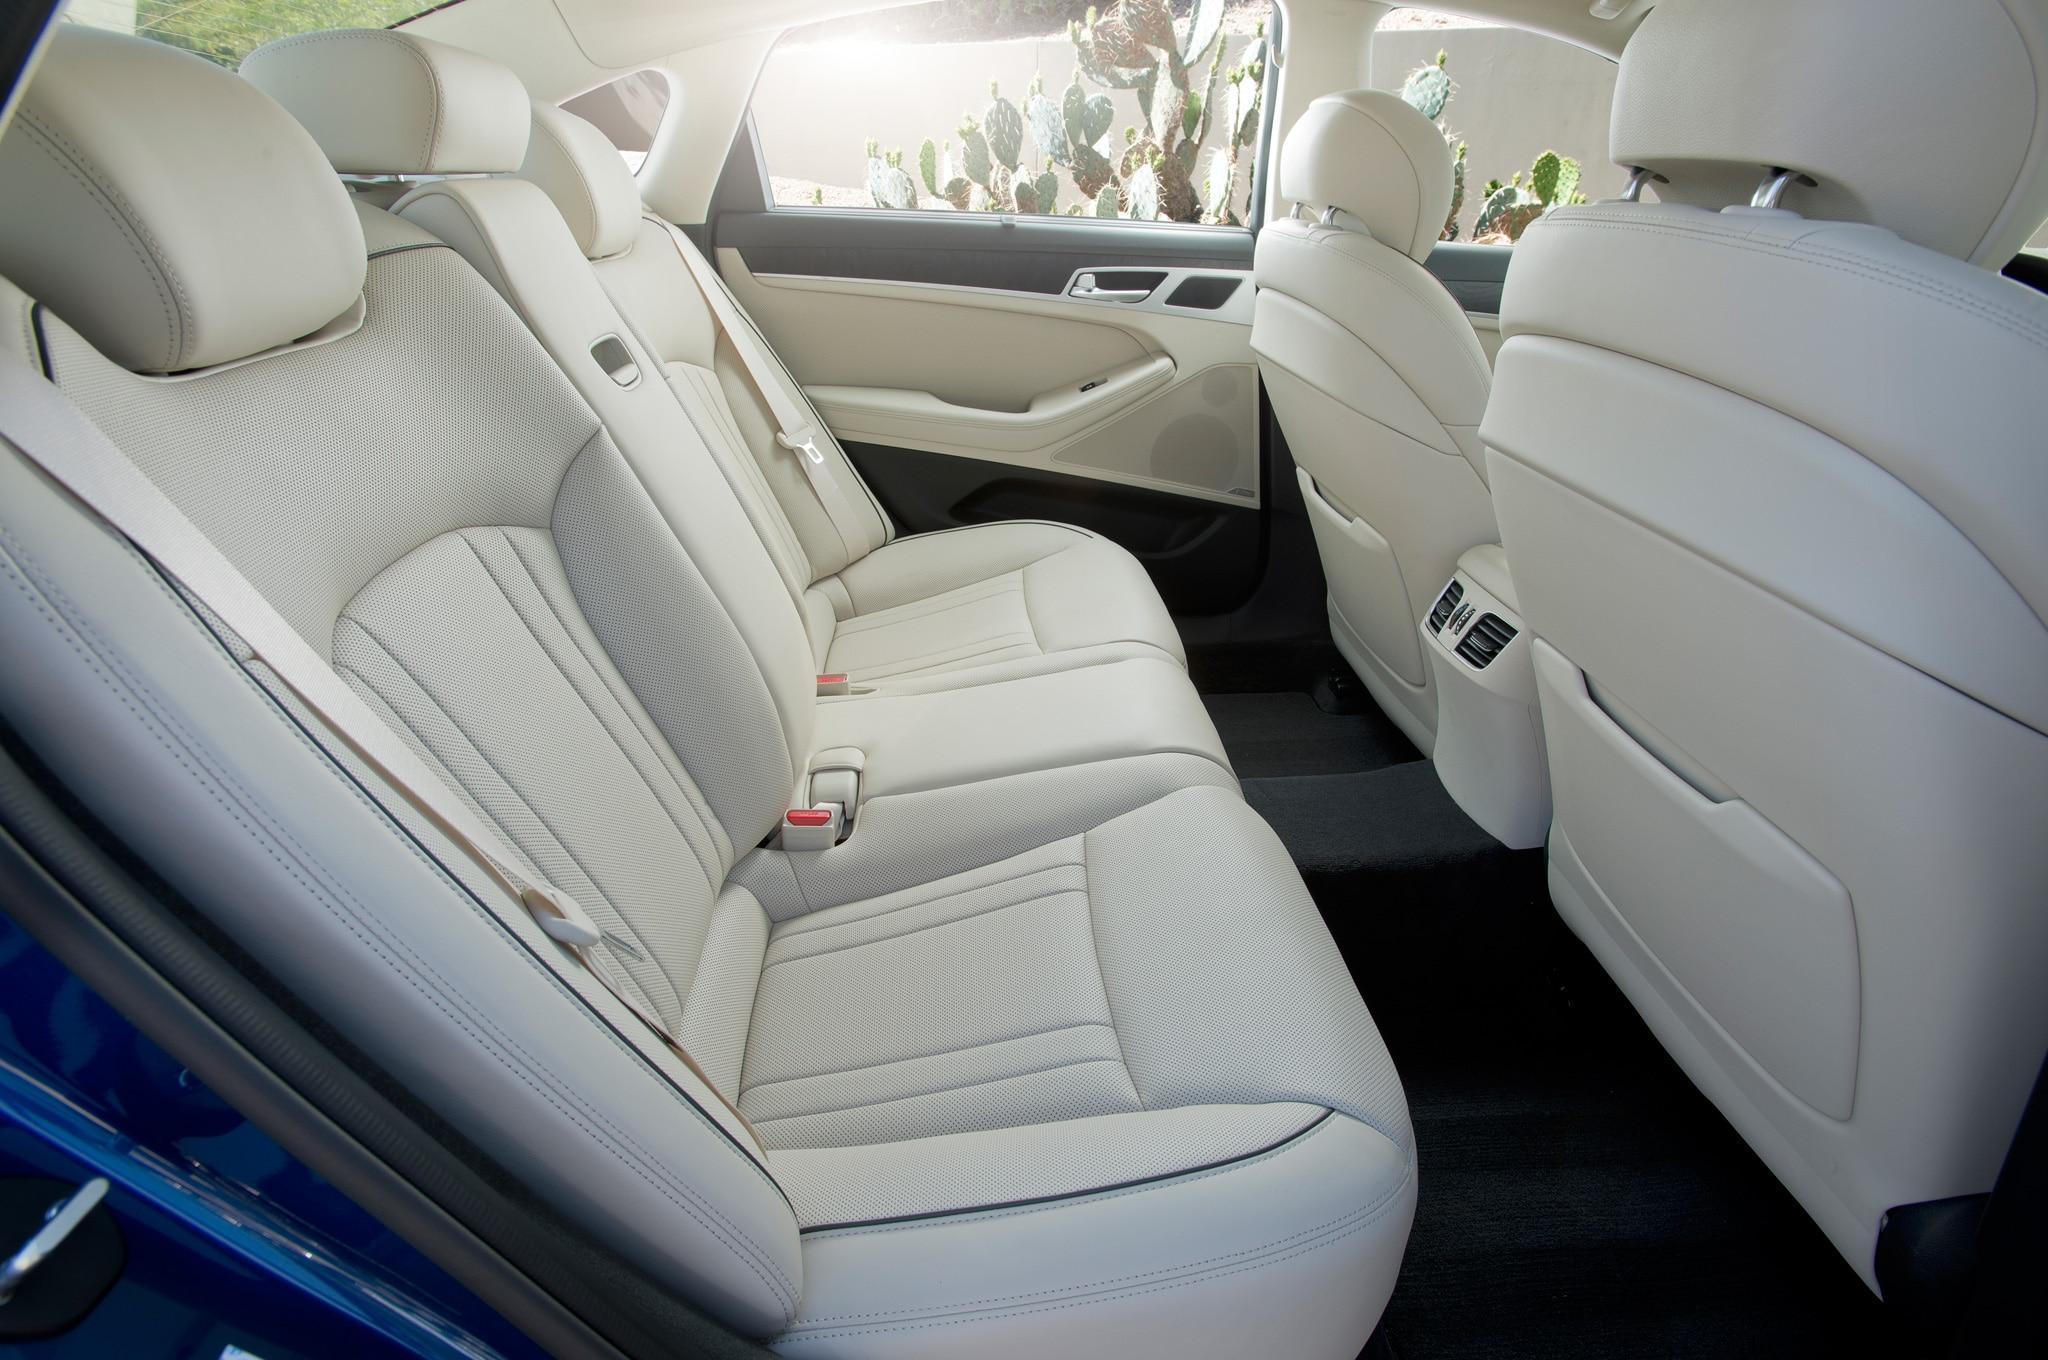 2015 Hyundai Genesis Sedan Interior Rear Seat Motor Trend En Espanol